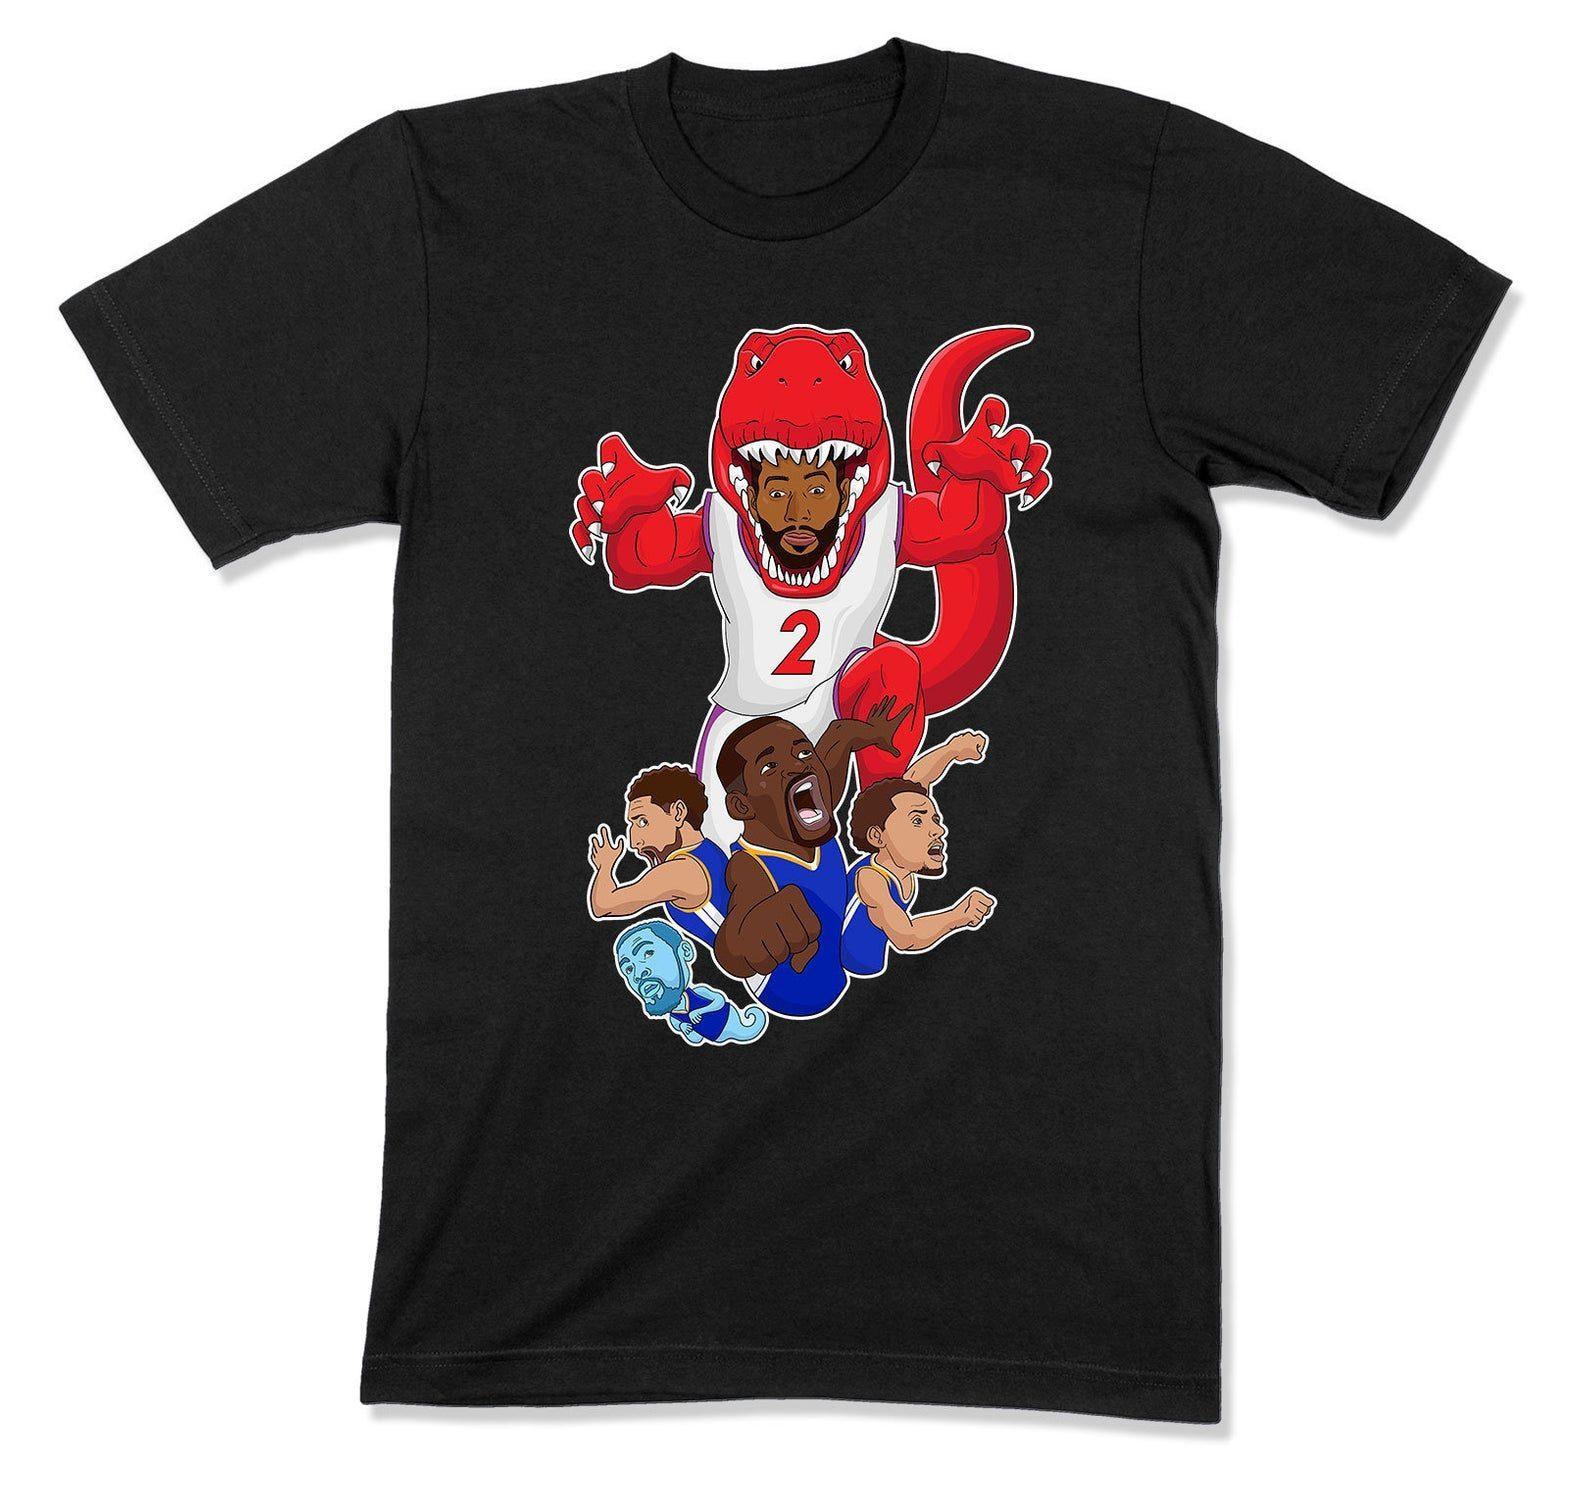 caca9fa93a3 Kawhi Leonard Shirt Raptors Finals Champ T Shirt Toronto Jurassic Park T  Shirt We The North